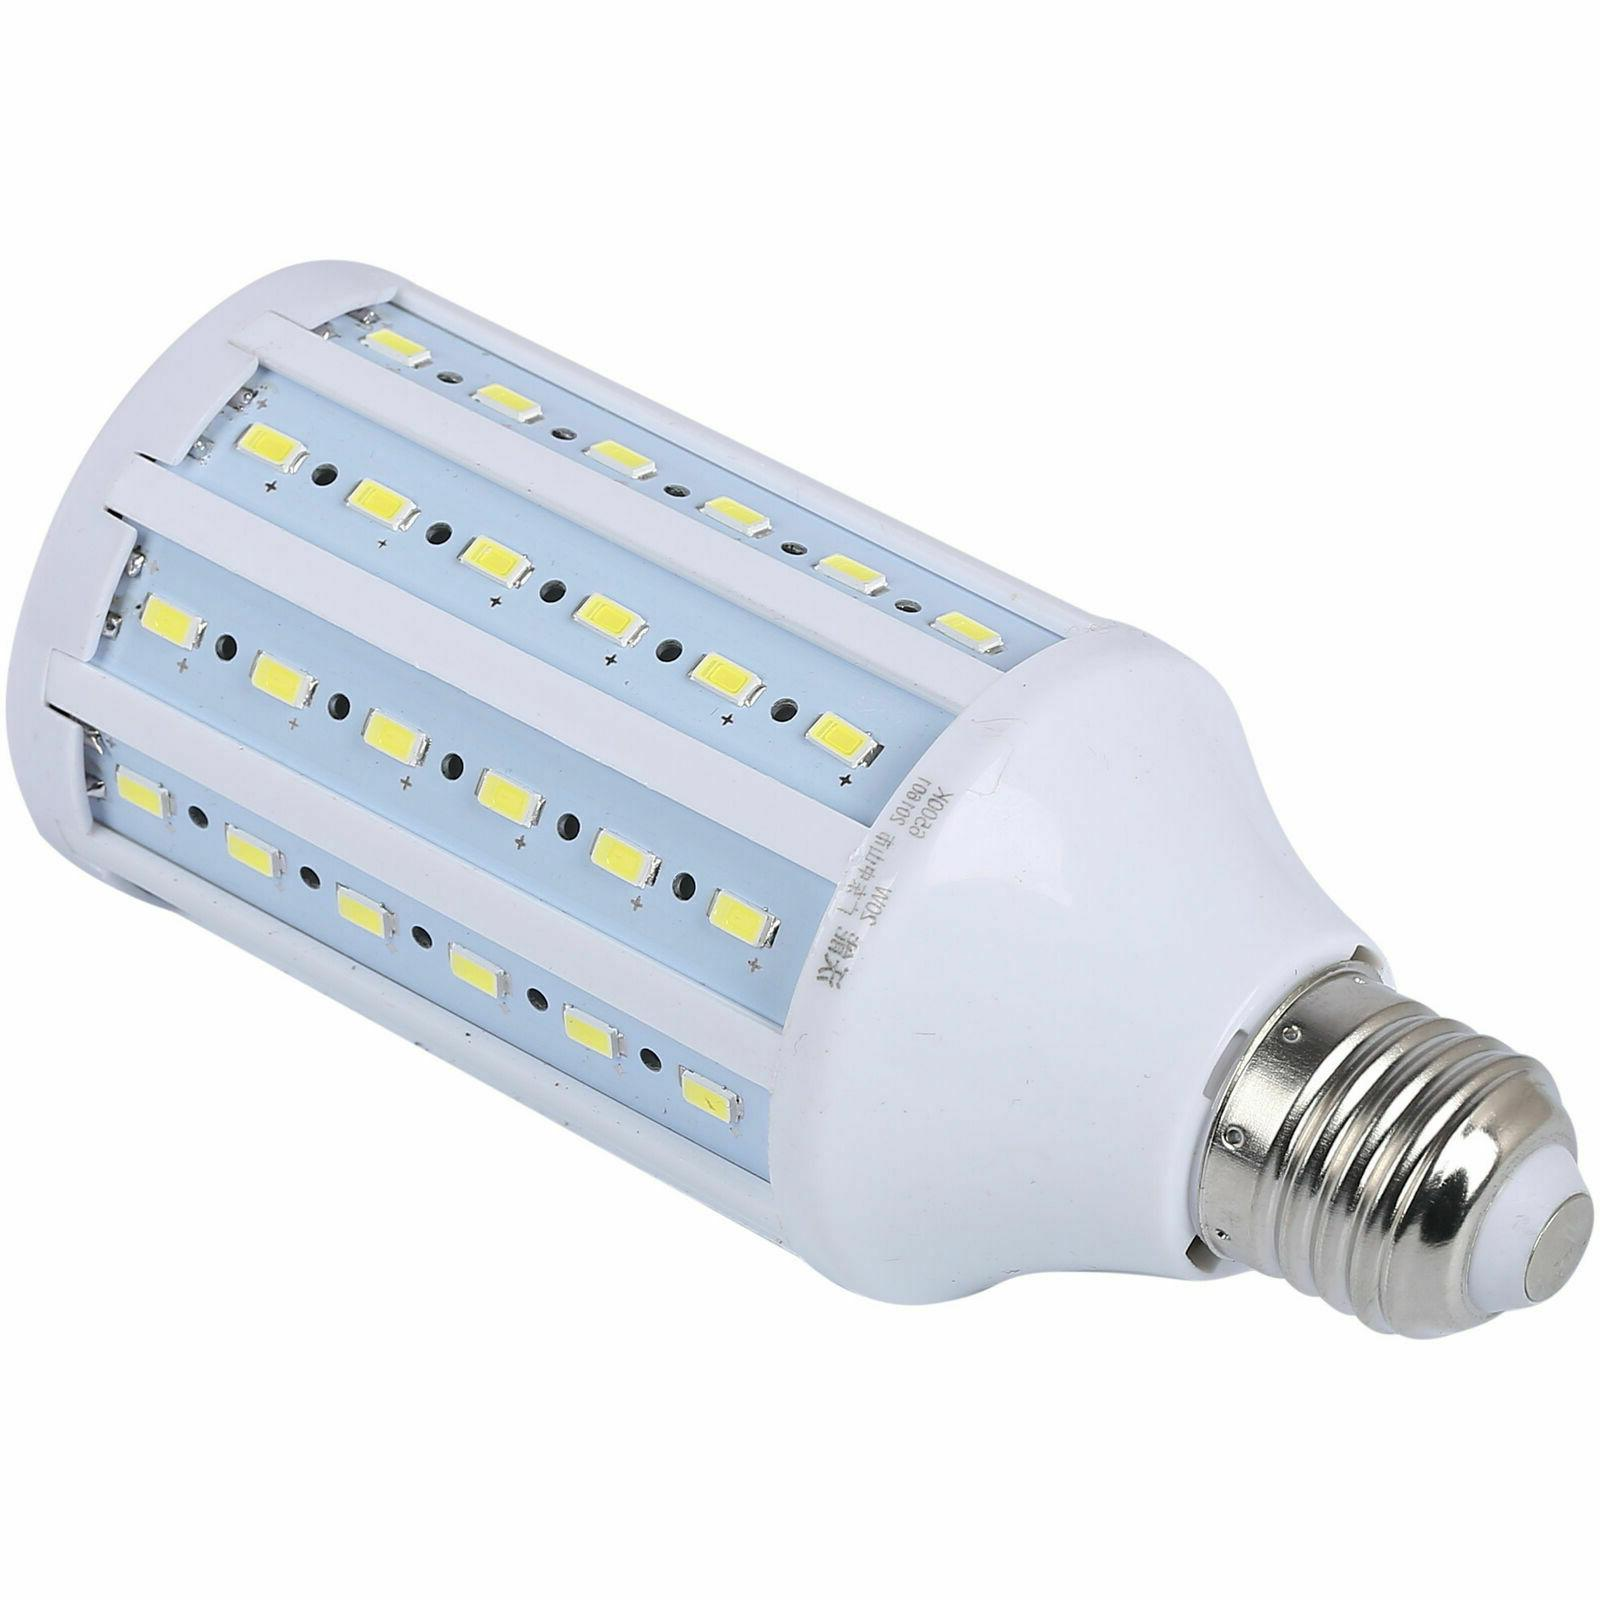 100W LED 75-Chip 1850lm 17W Cool 6000K